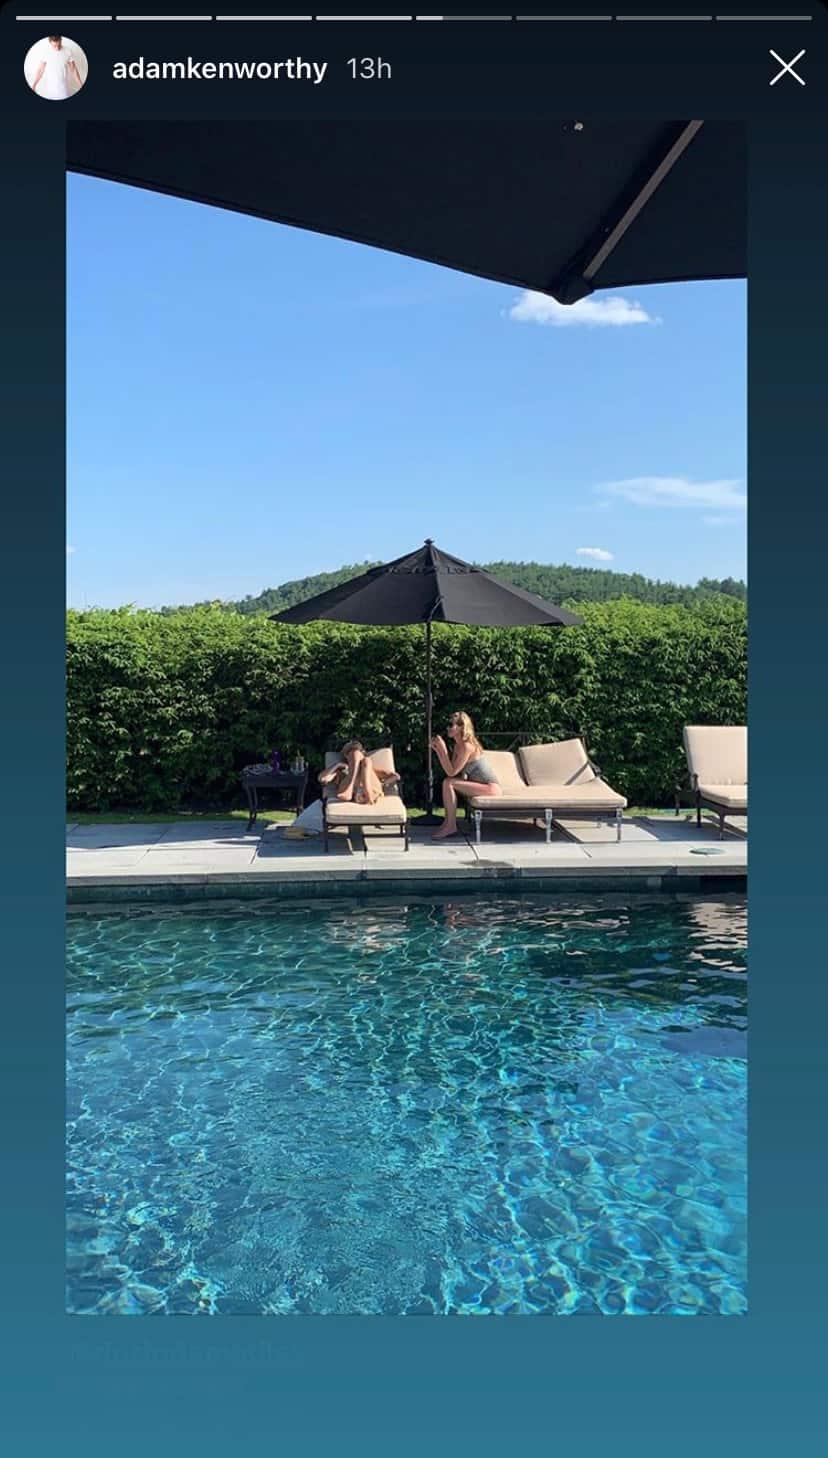 RHONY Dorinda Medley and Carole Radziwill Enjoy the Pool at Blue Stone Manor